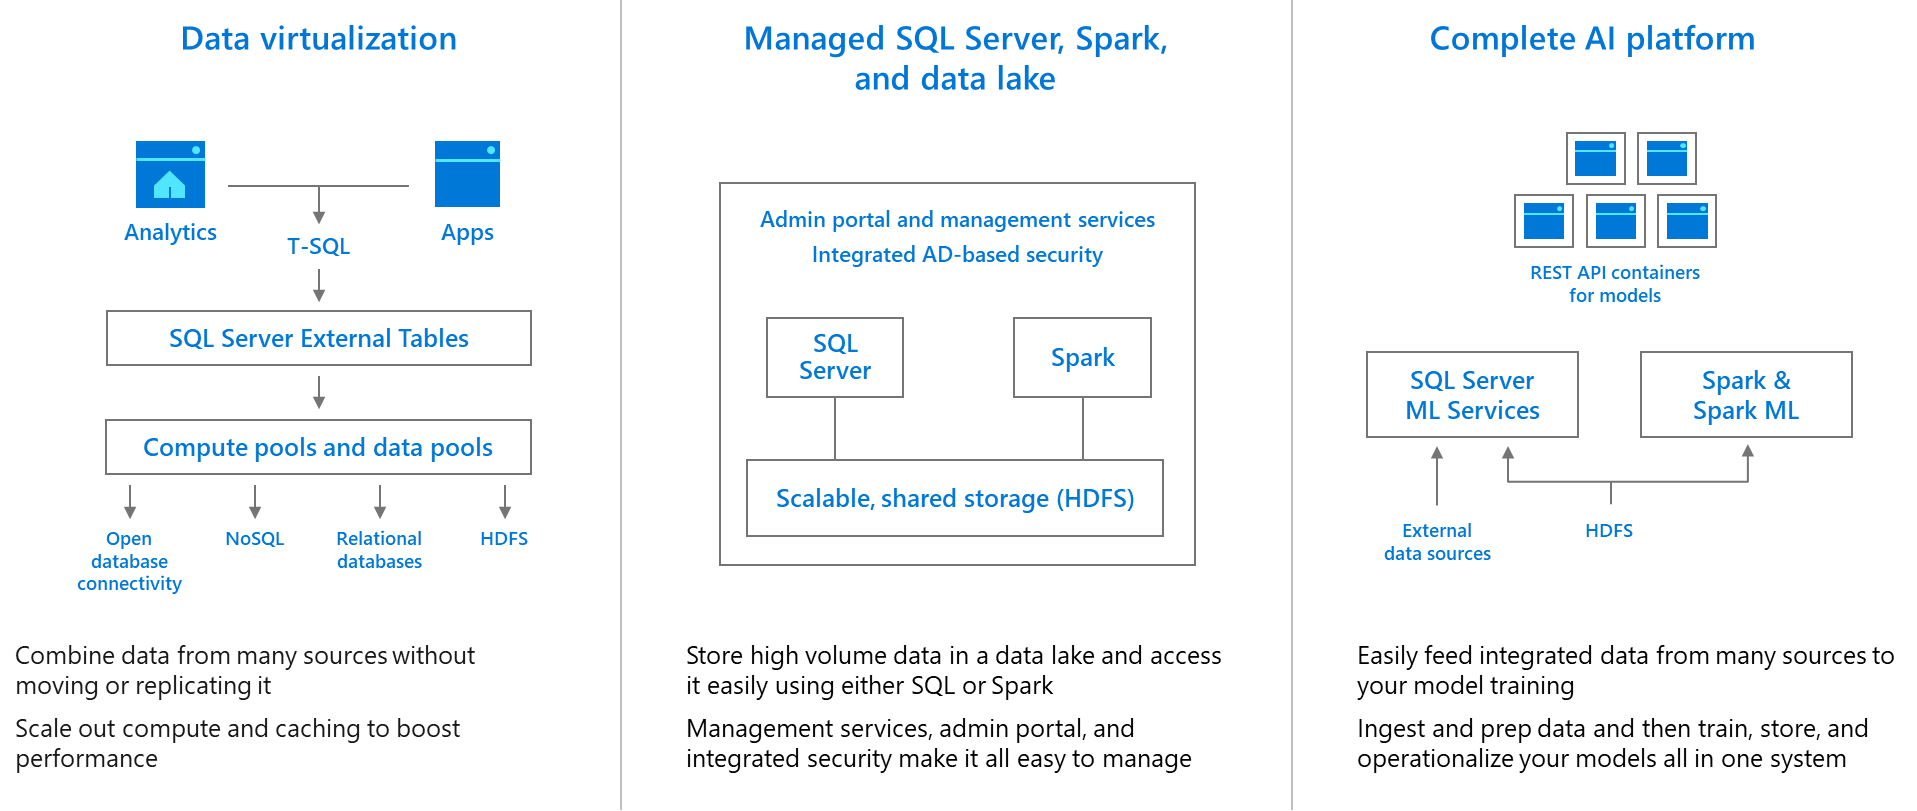 SQL Server 2019 installation errors Data-virtualization-managed-sql-server-spark-and-data-lake-complete-ai-platform.png